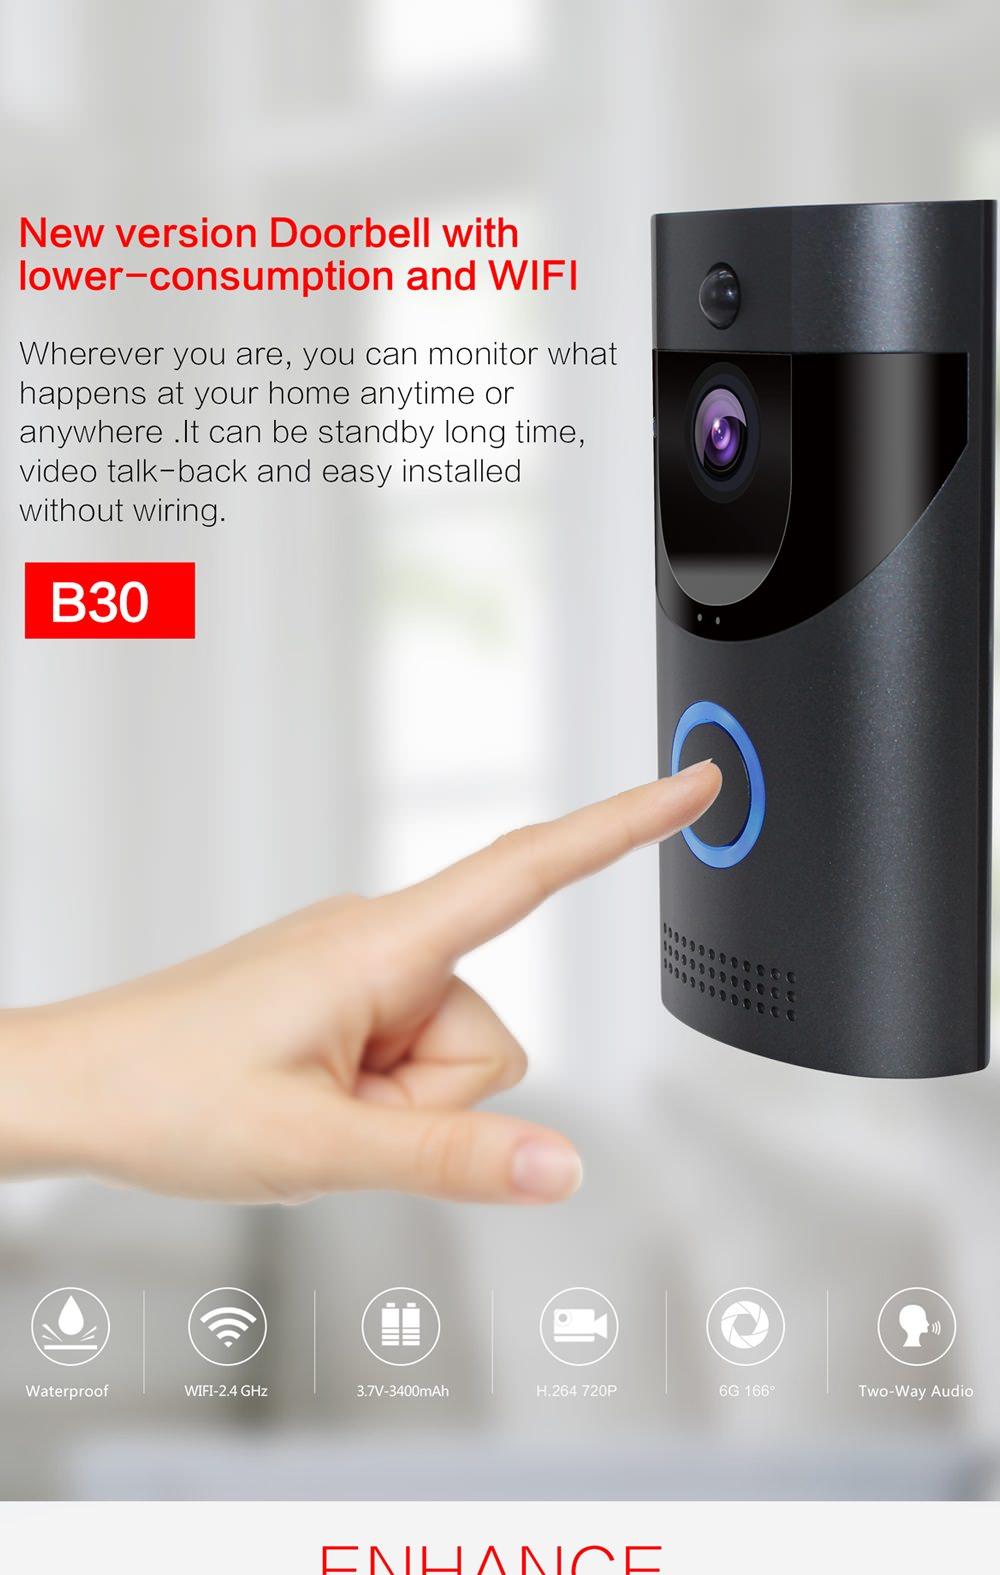 anytek b30 wifi video doorbell